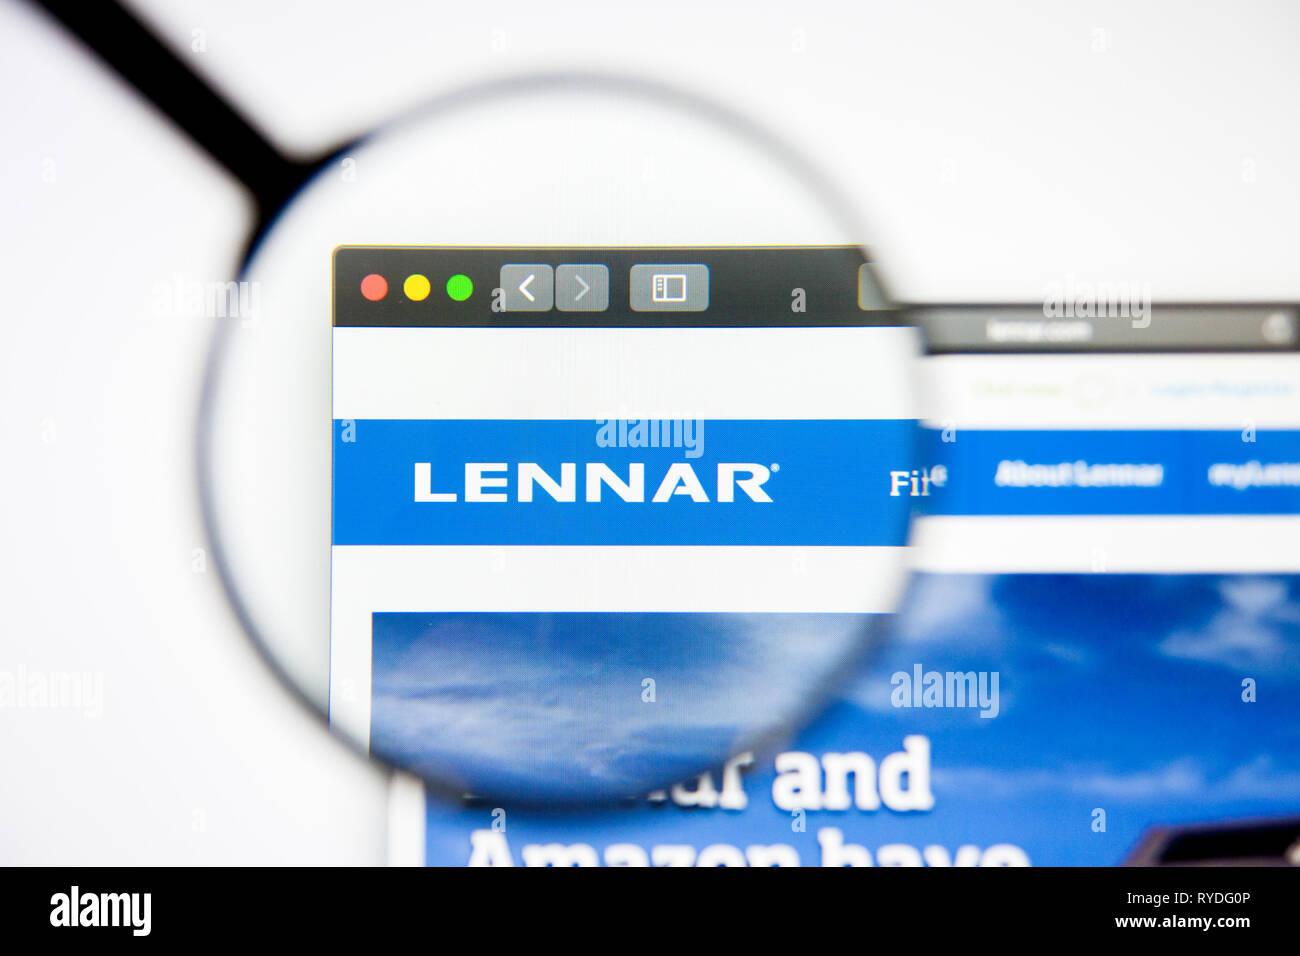 Los Angeles, Kalifornien, USA - 5. März 2019: Lennar Homepage. Lennar Logo sichtbar auf dem Display, Illustrative Editorial Stockbild